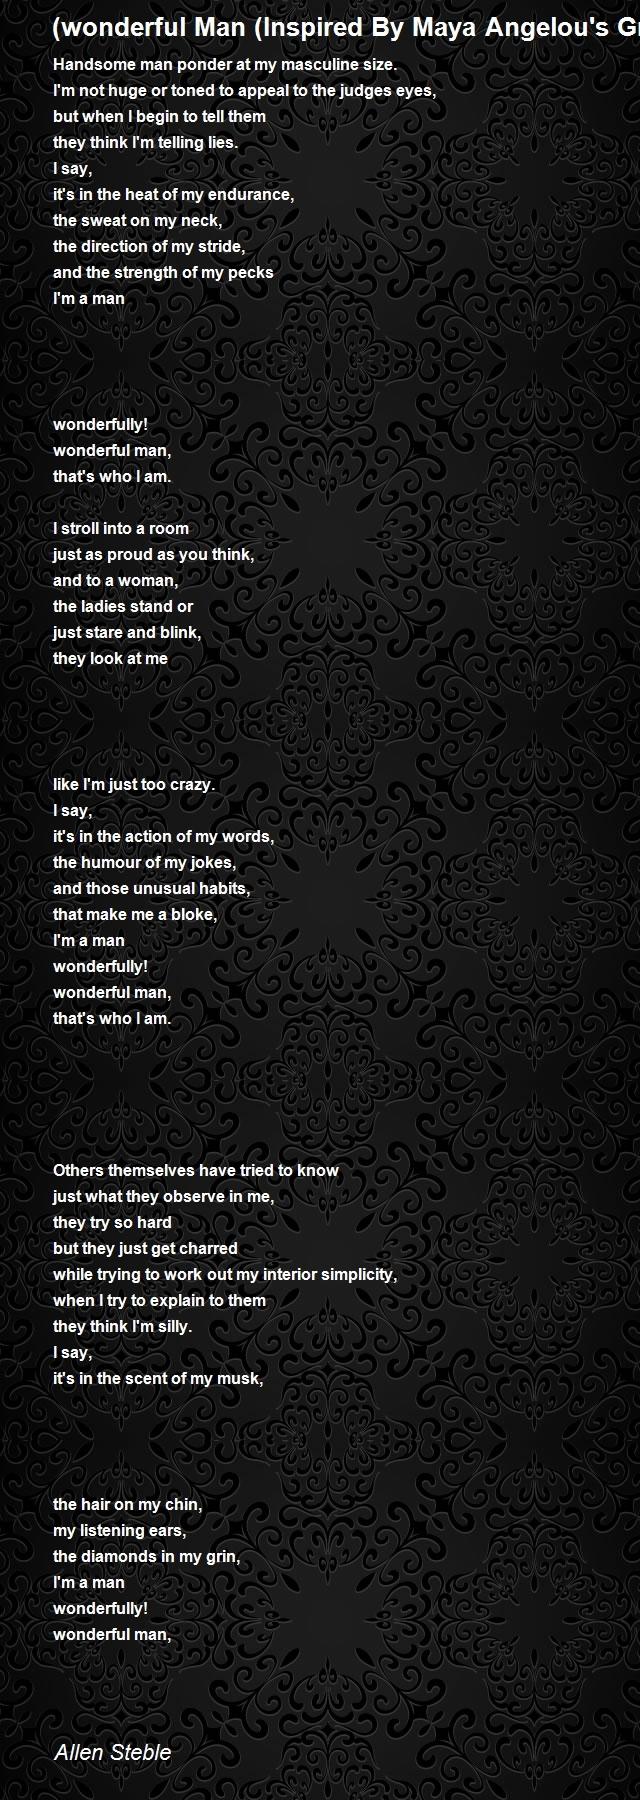 Wonderful Man Inspired By Maya Angelous Great Poem Phenomenal